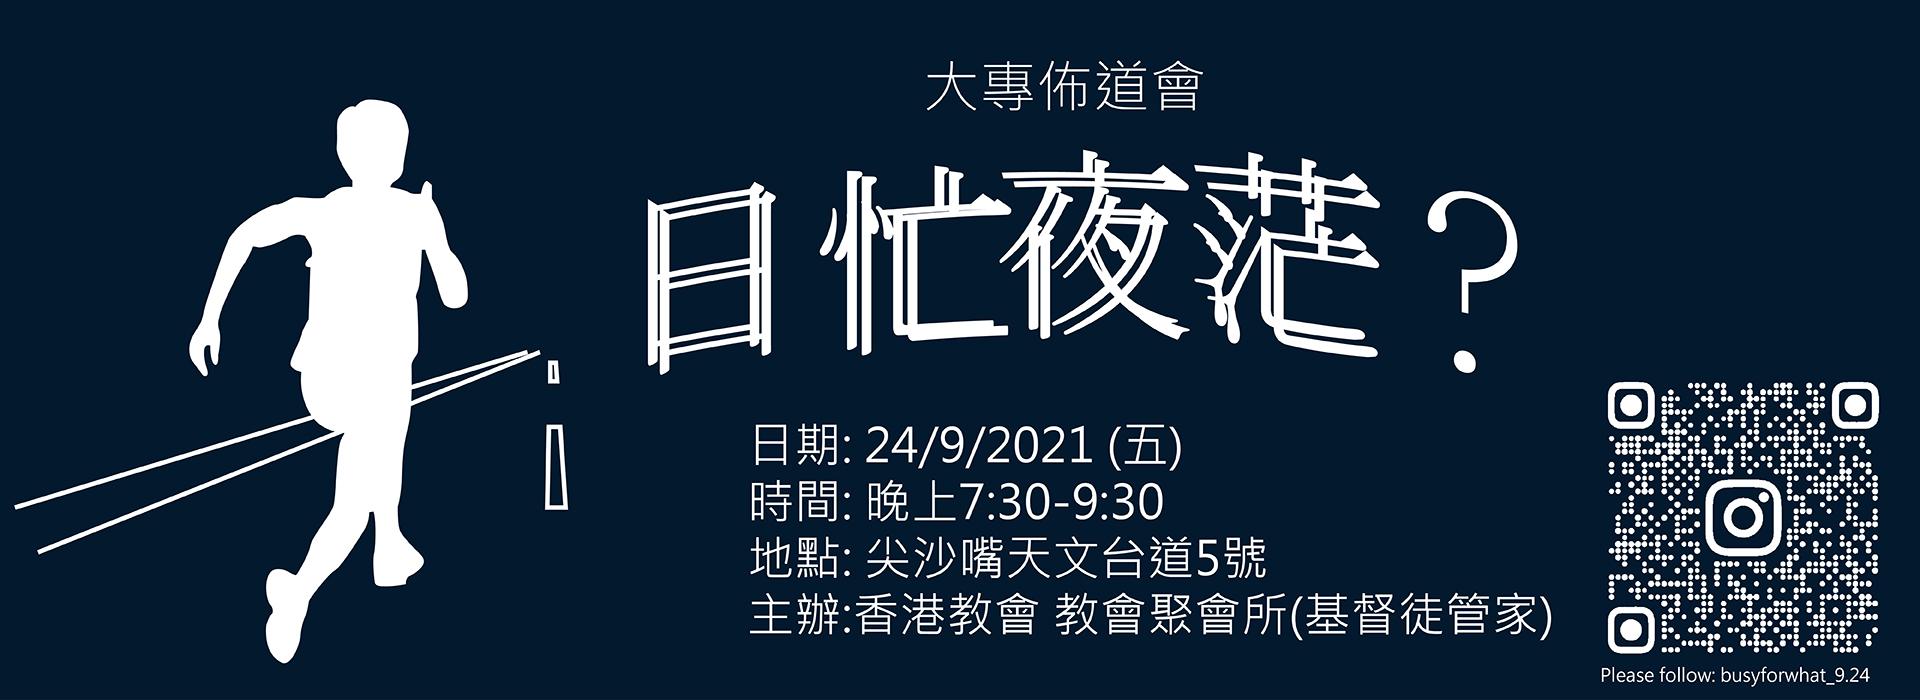 Web_主頁Banner